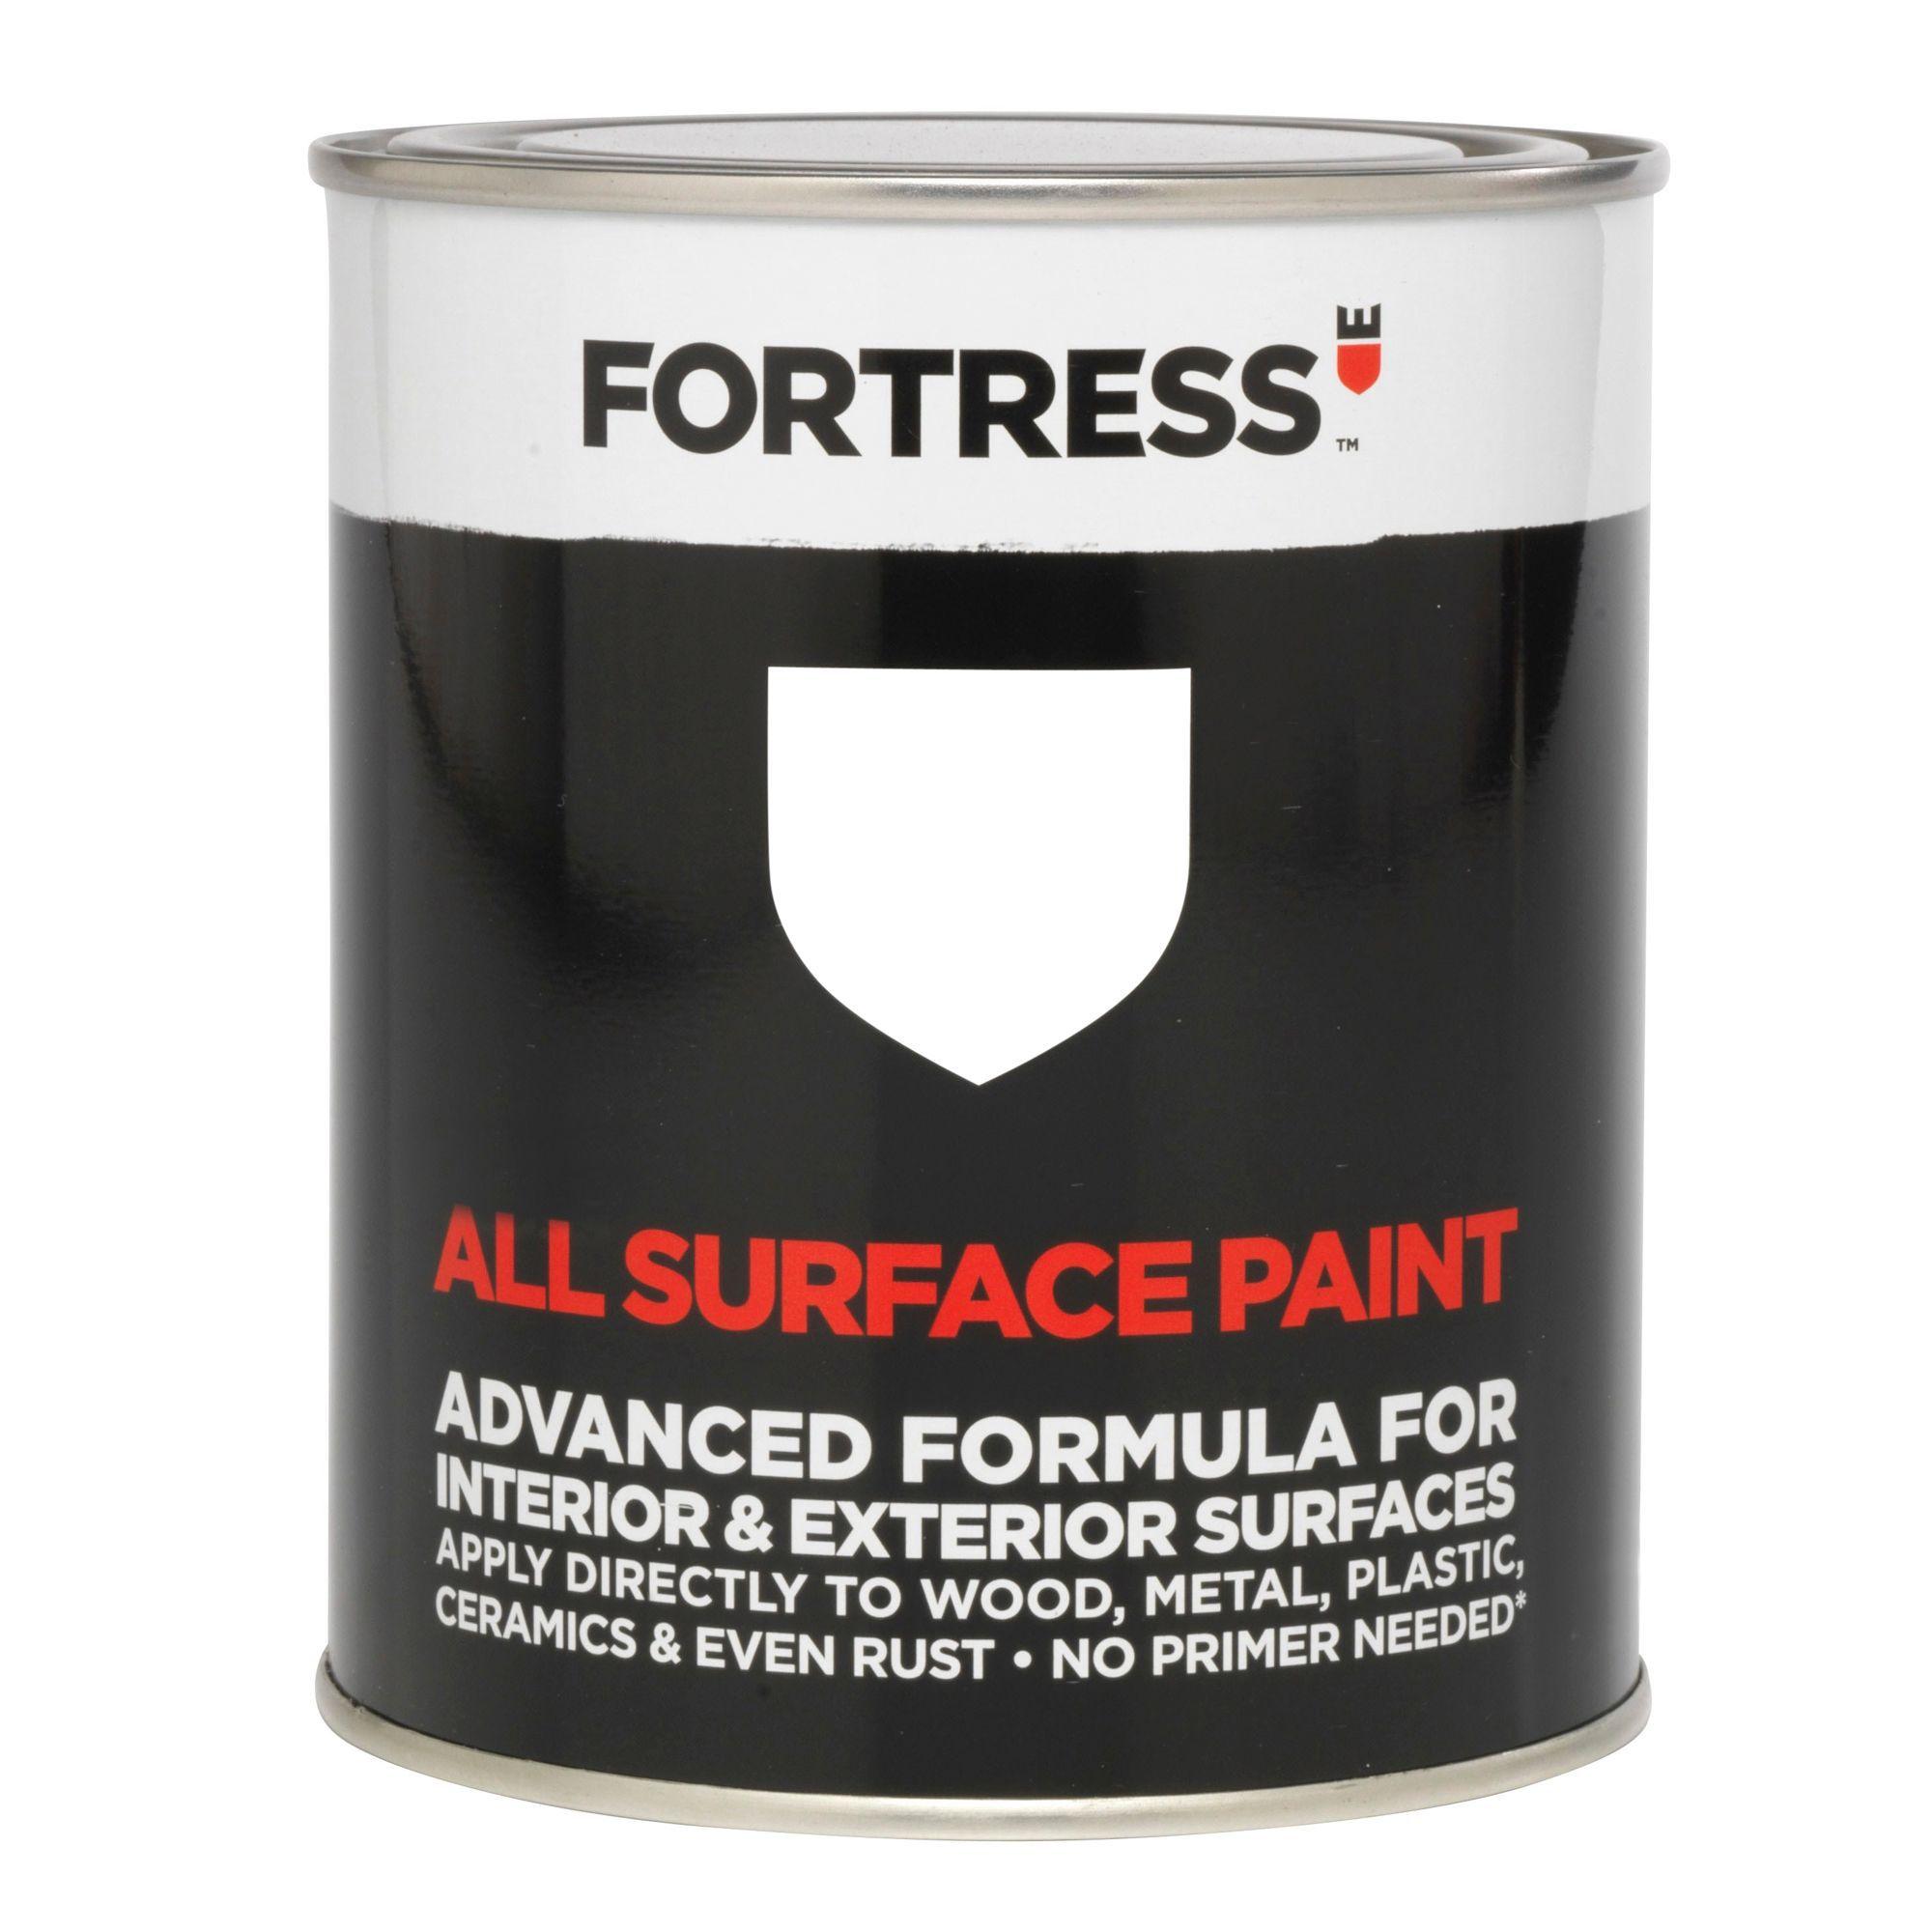 Fortress Interior & Exterior White Gloss Multipurpose Paint 250ml